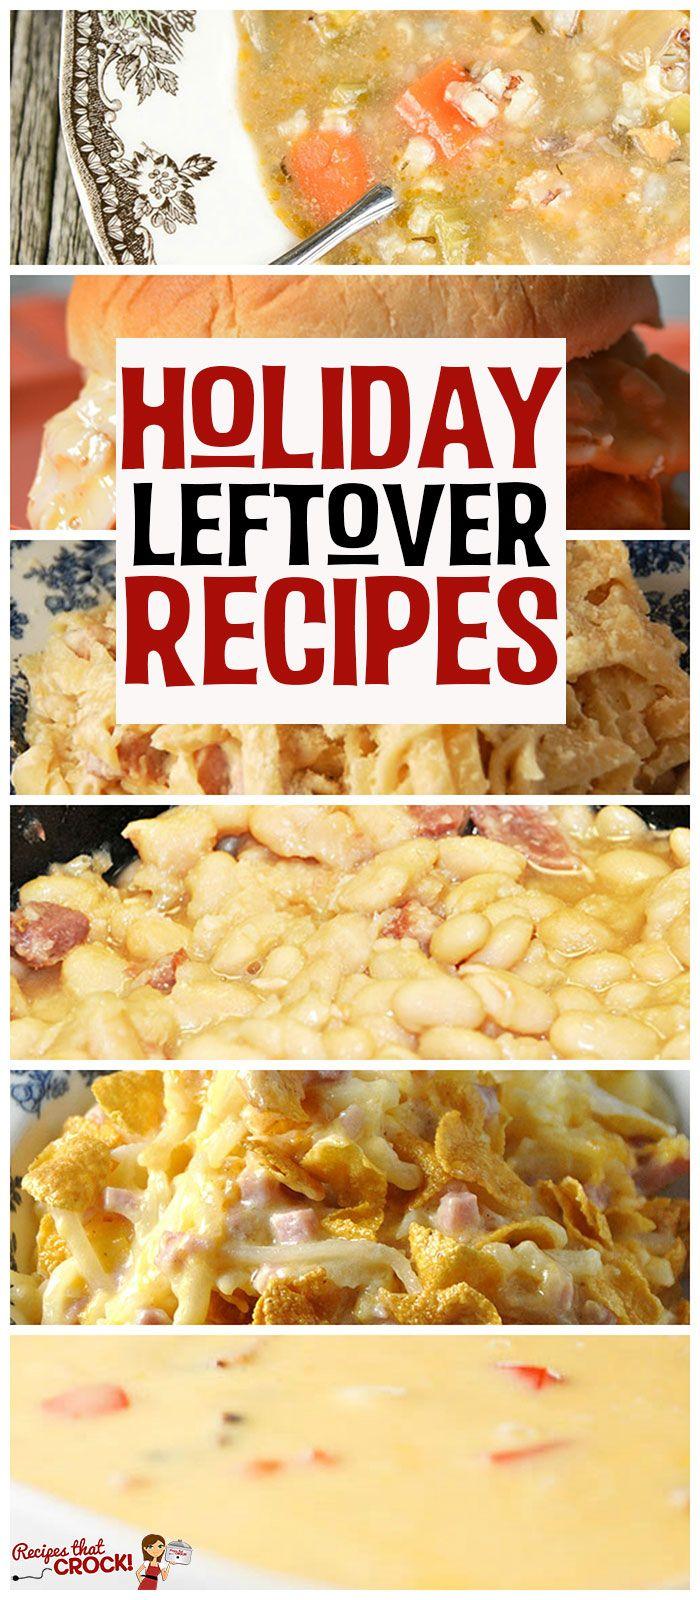 Turkey Ham Leftover Recipes 17 Best Images About Rtcs Holiday Crock Pot Recipes On Pinterest